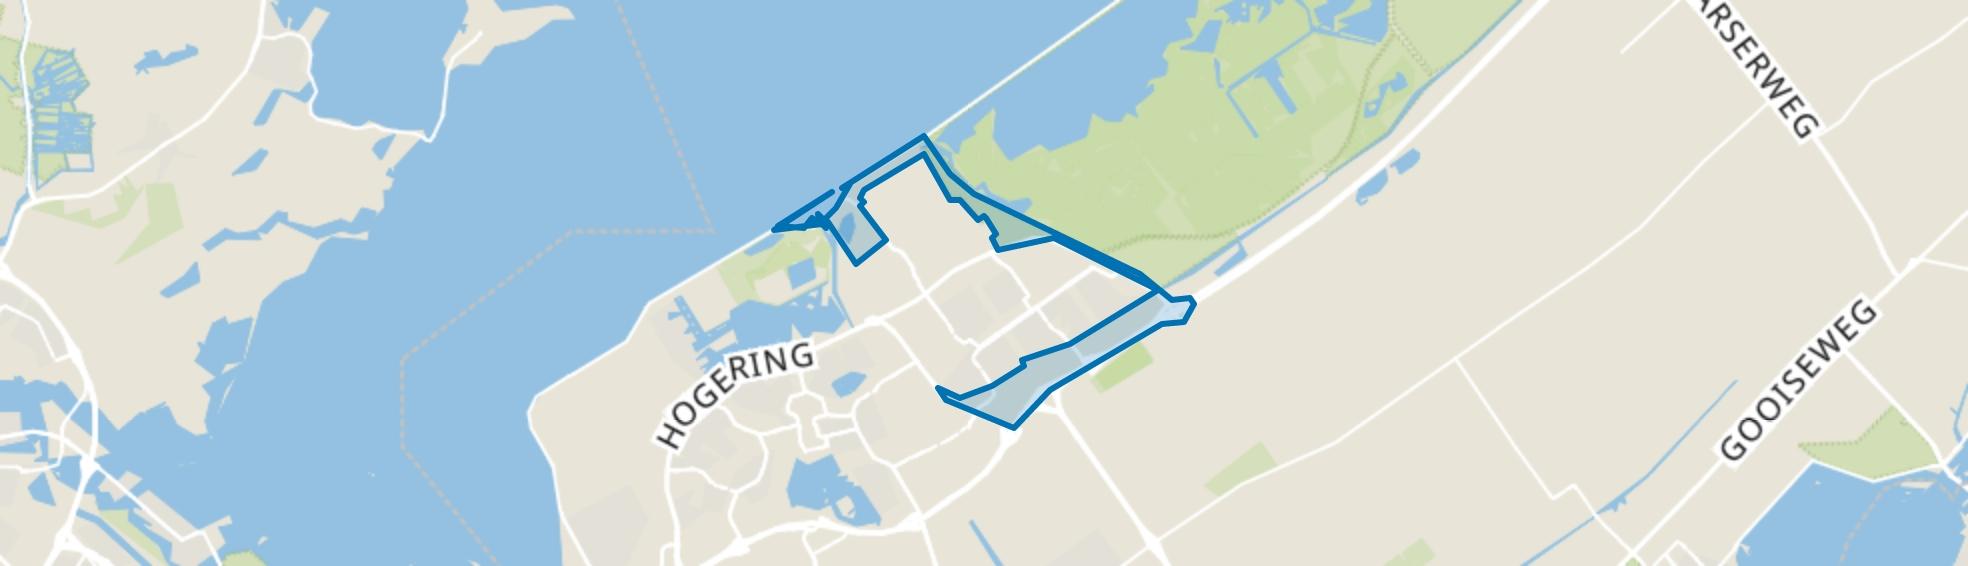 Overig Almere Buiten, Almere map